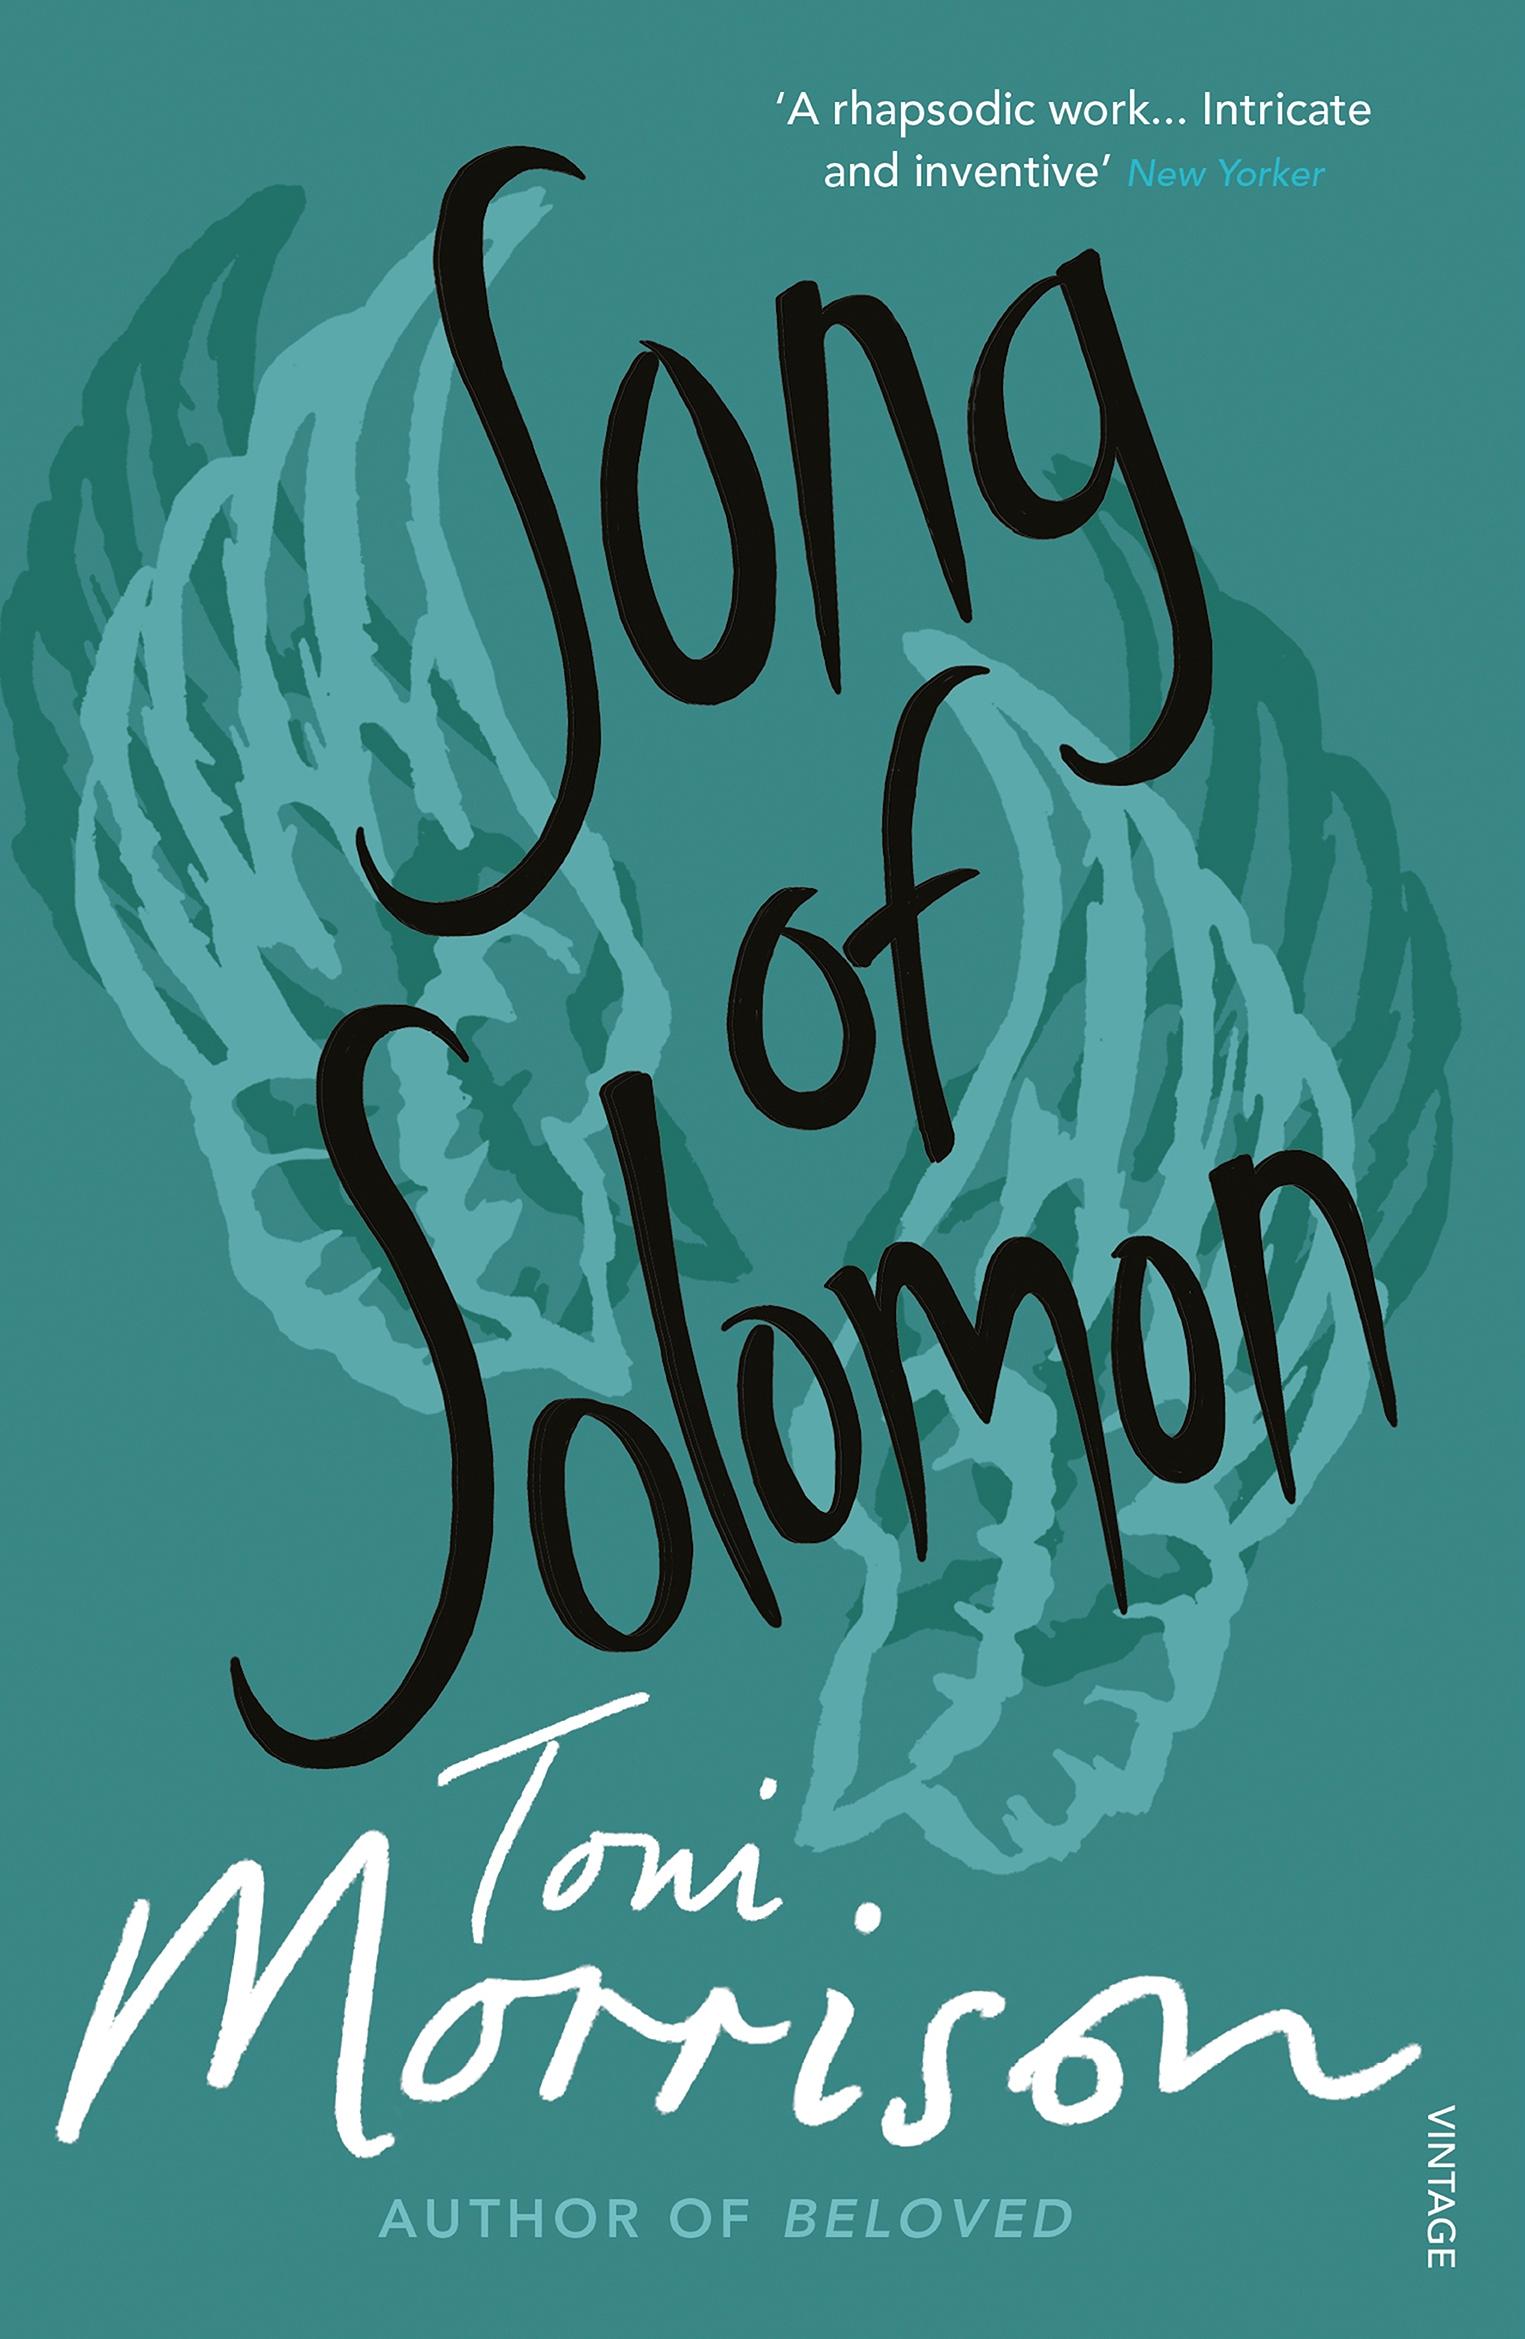 Song of Solomon by Toni Morrison - Penguin Books New Zealand